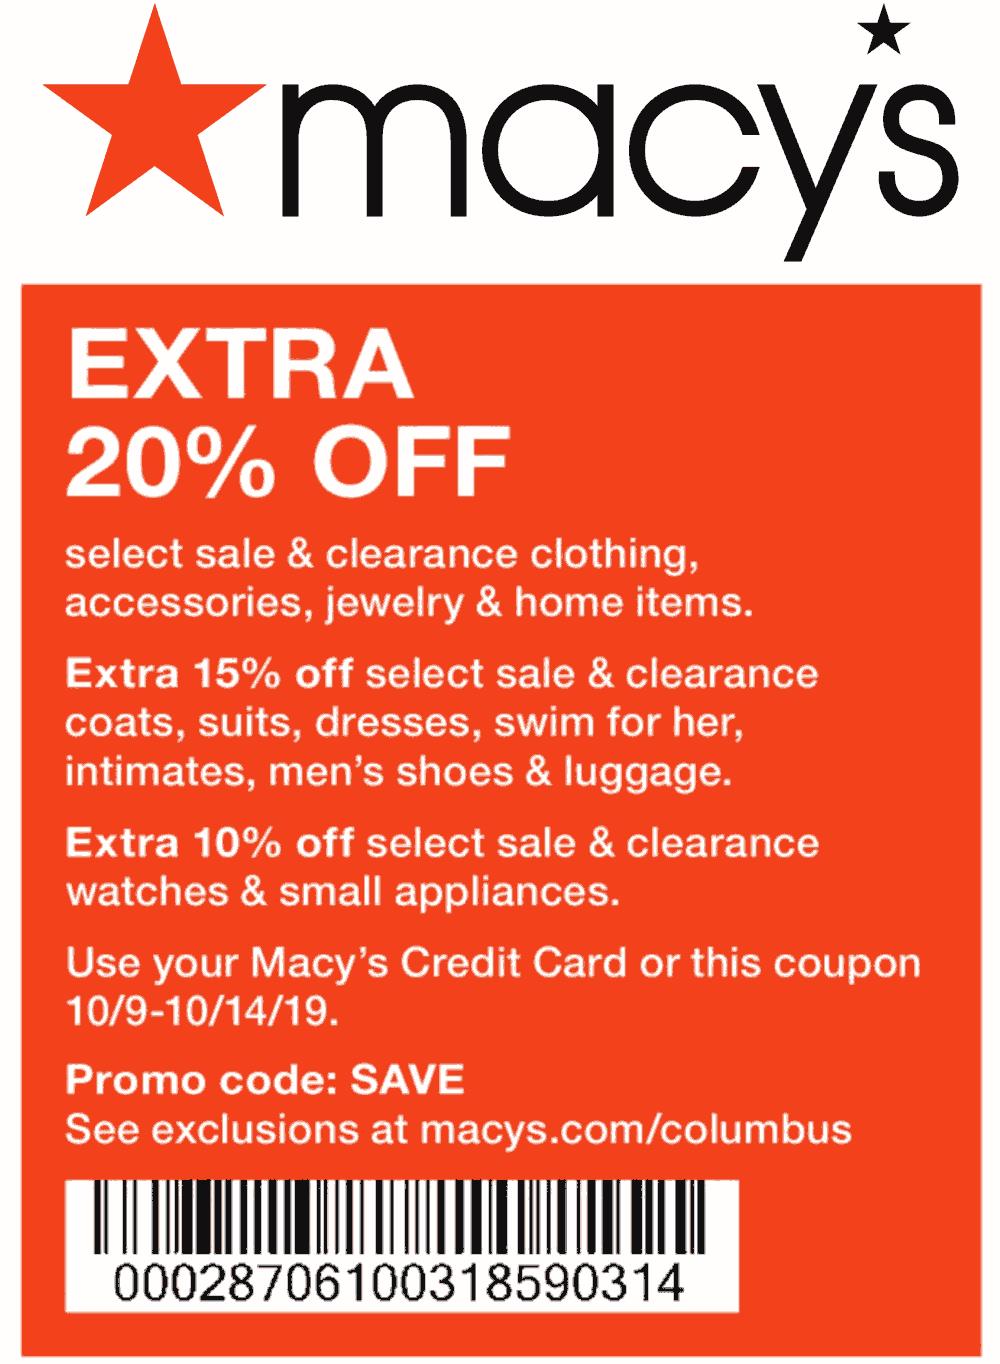 Macys Coupon January 2020 Extra 20% off at Macys, or online via promo code SAVE